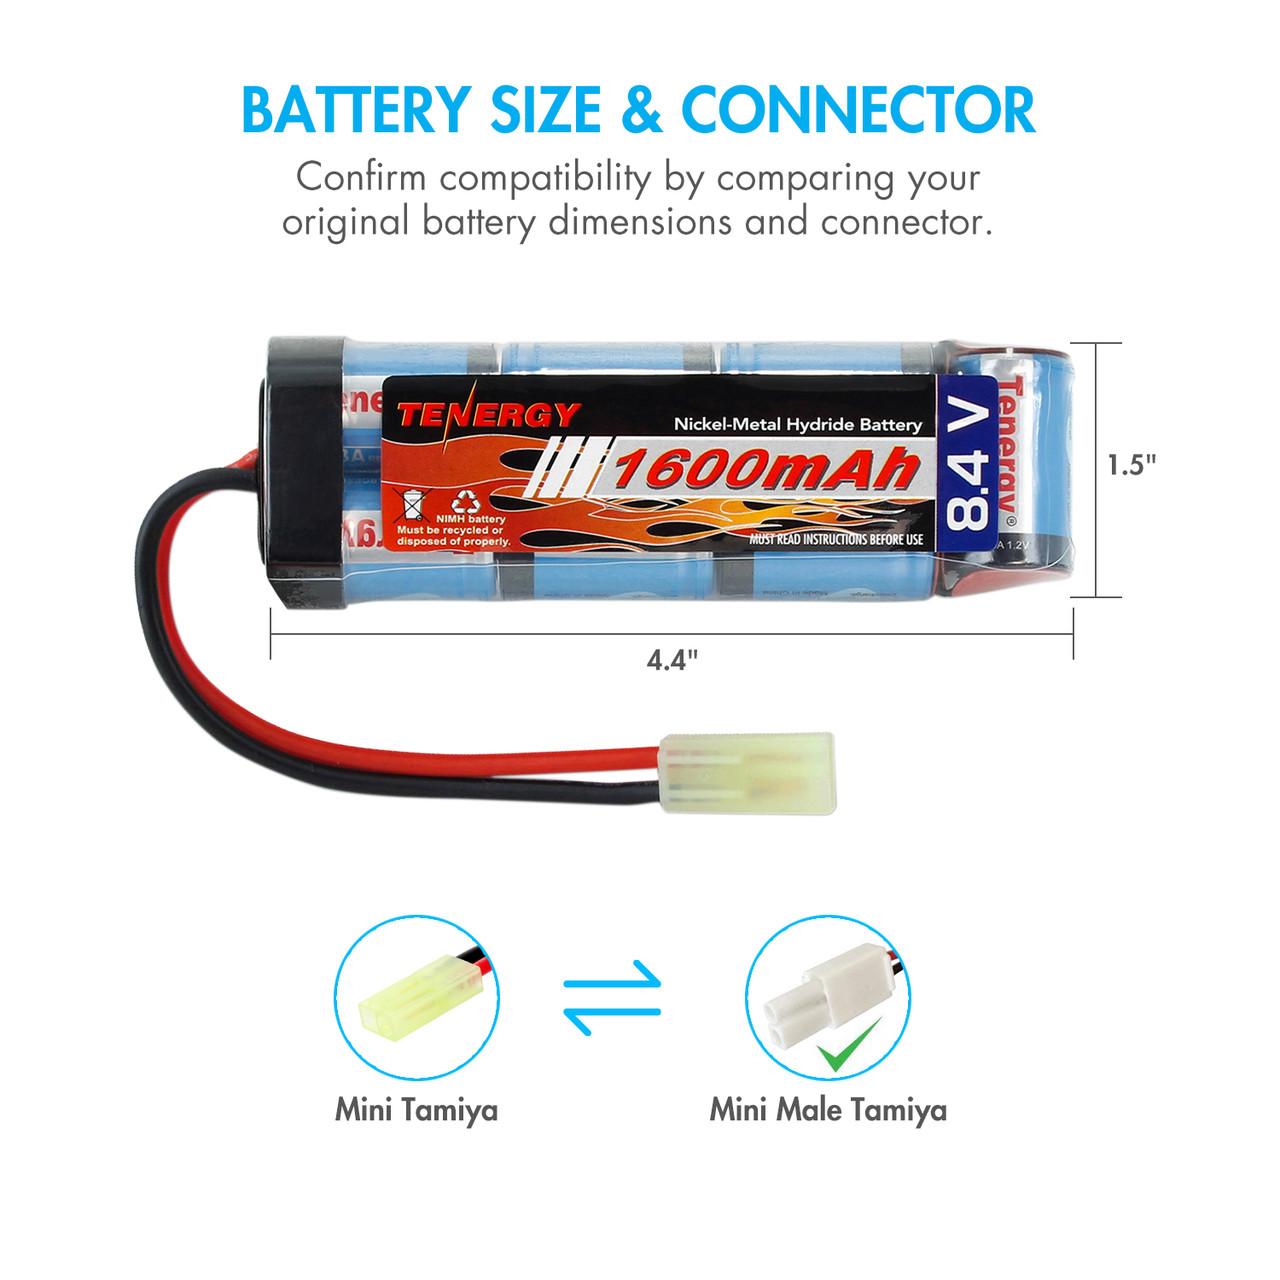 Tenergy Airsoft NiMH 8.4V 1600mAh Flat Battery Pack w/ Mini Tamiya